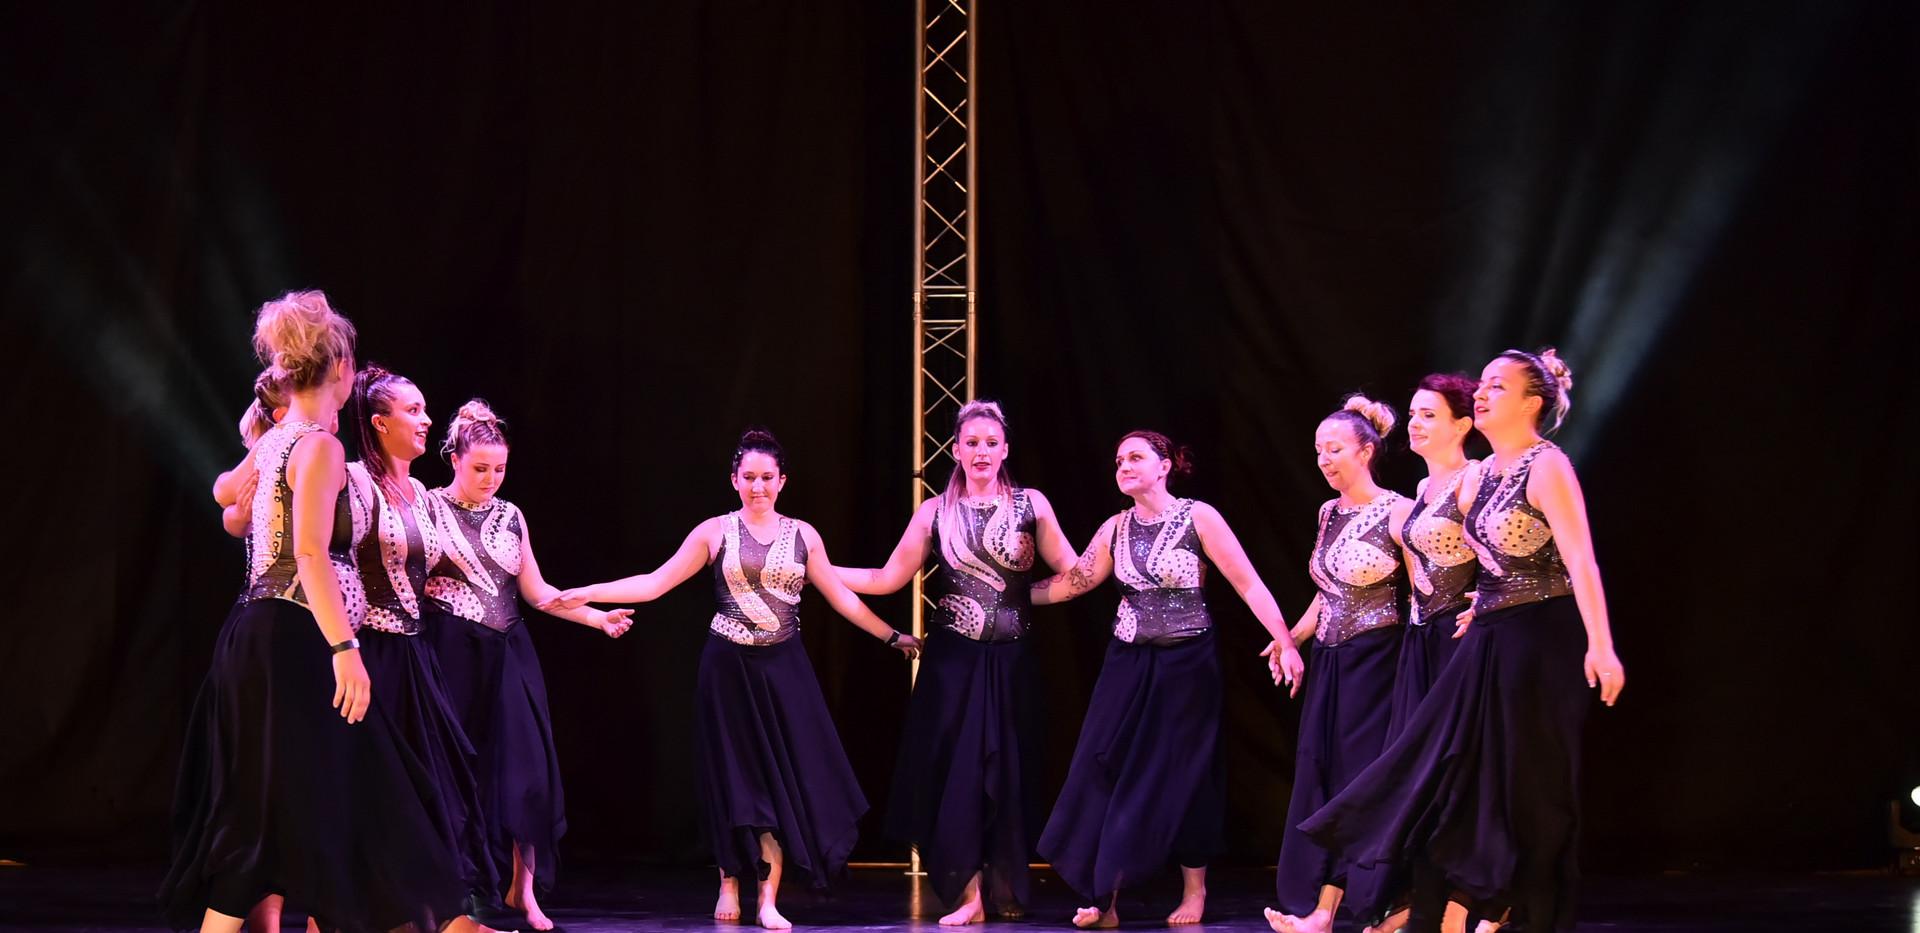 DANCE SHOW 19 - LES ANGELS (118)_GF.jpg